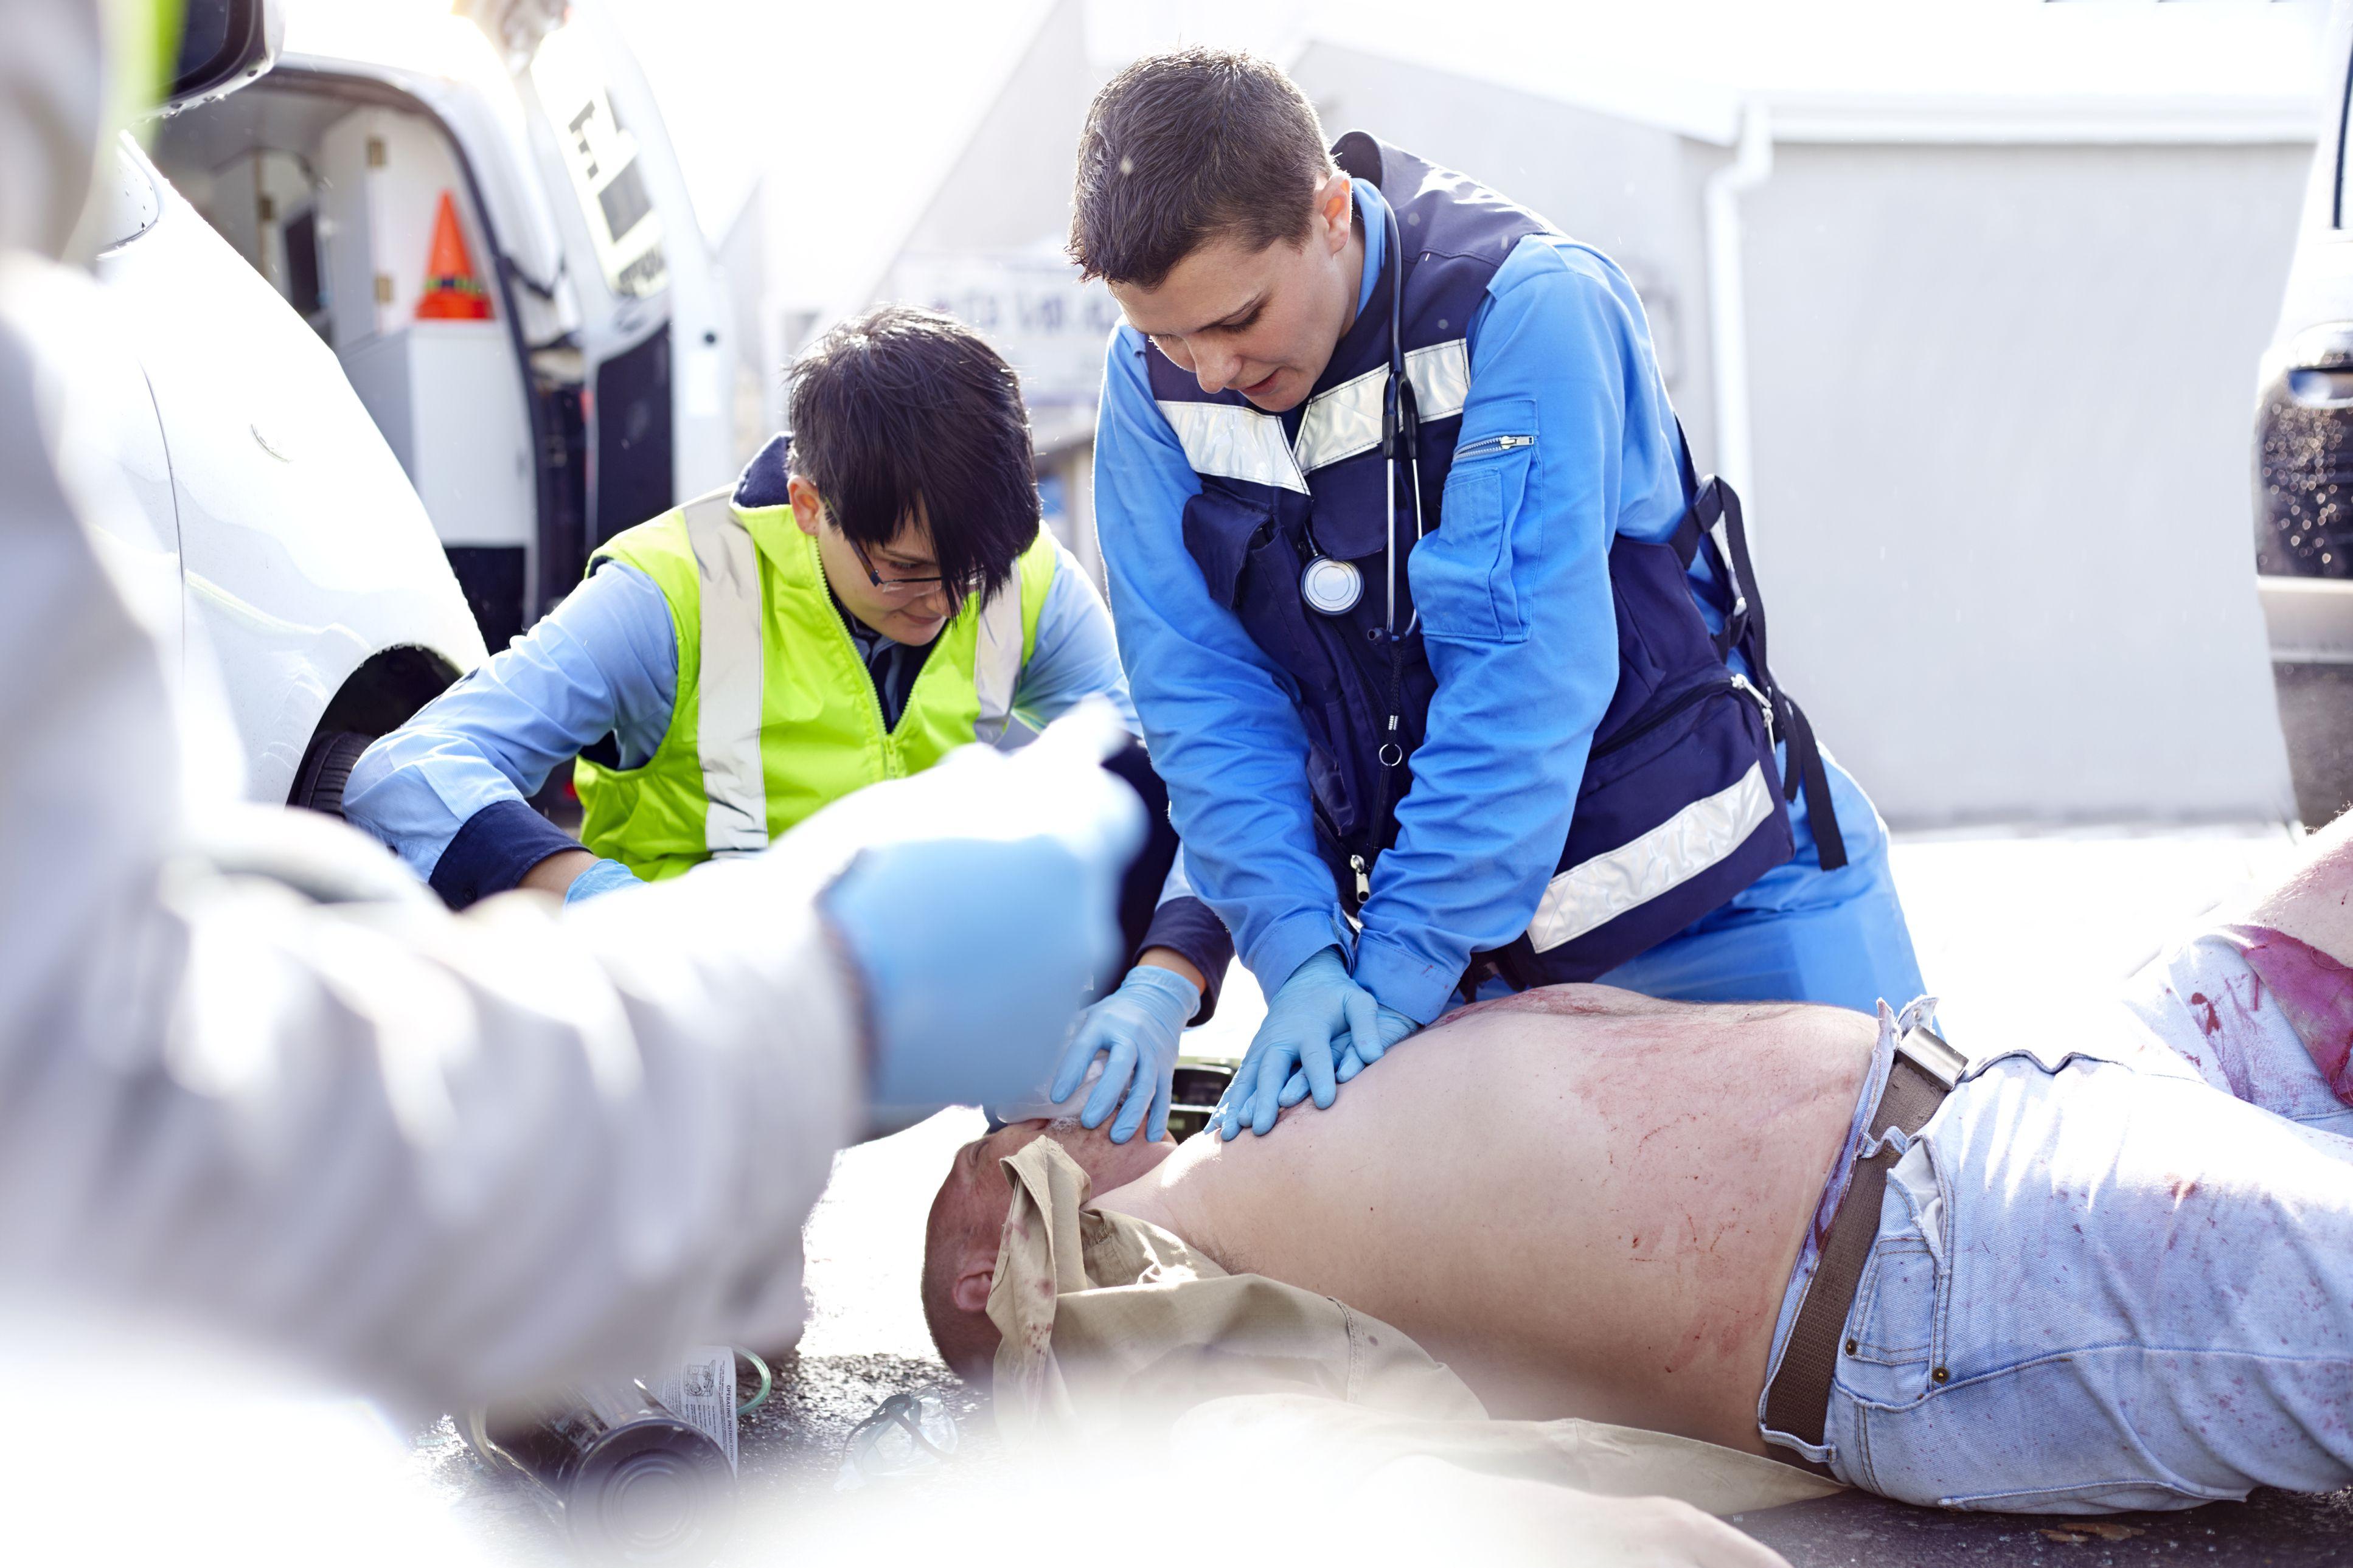 How to Perform Pit Crew Cardiac Arrest Resuscitation